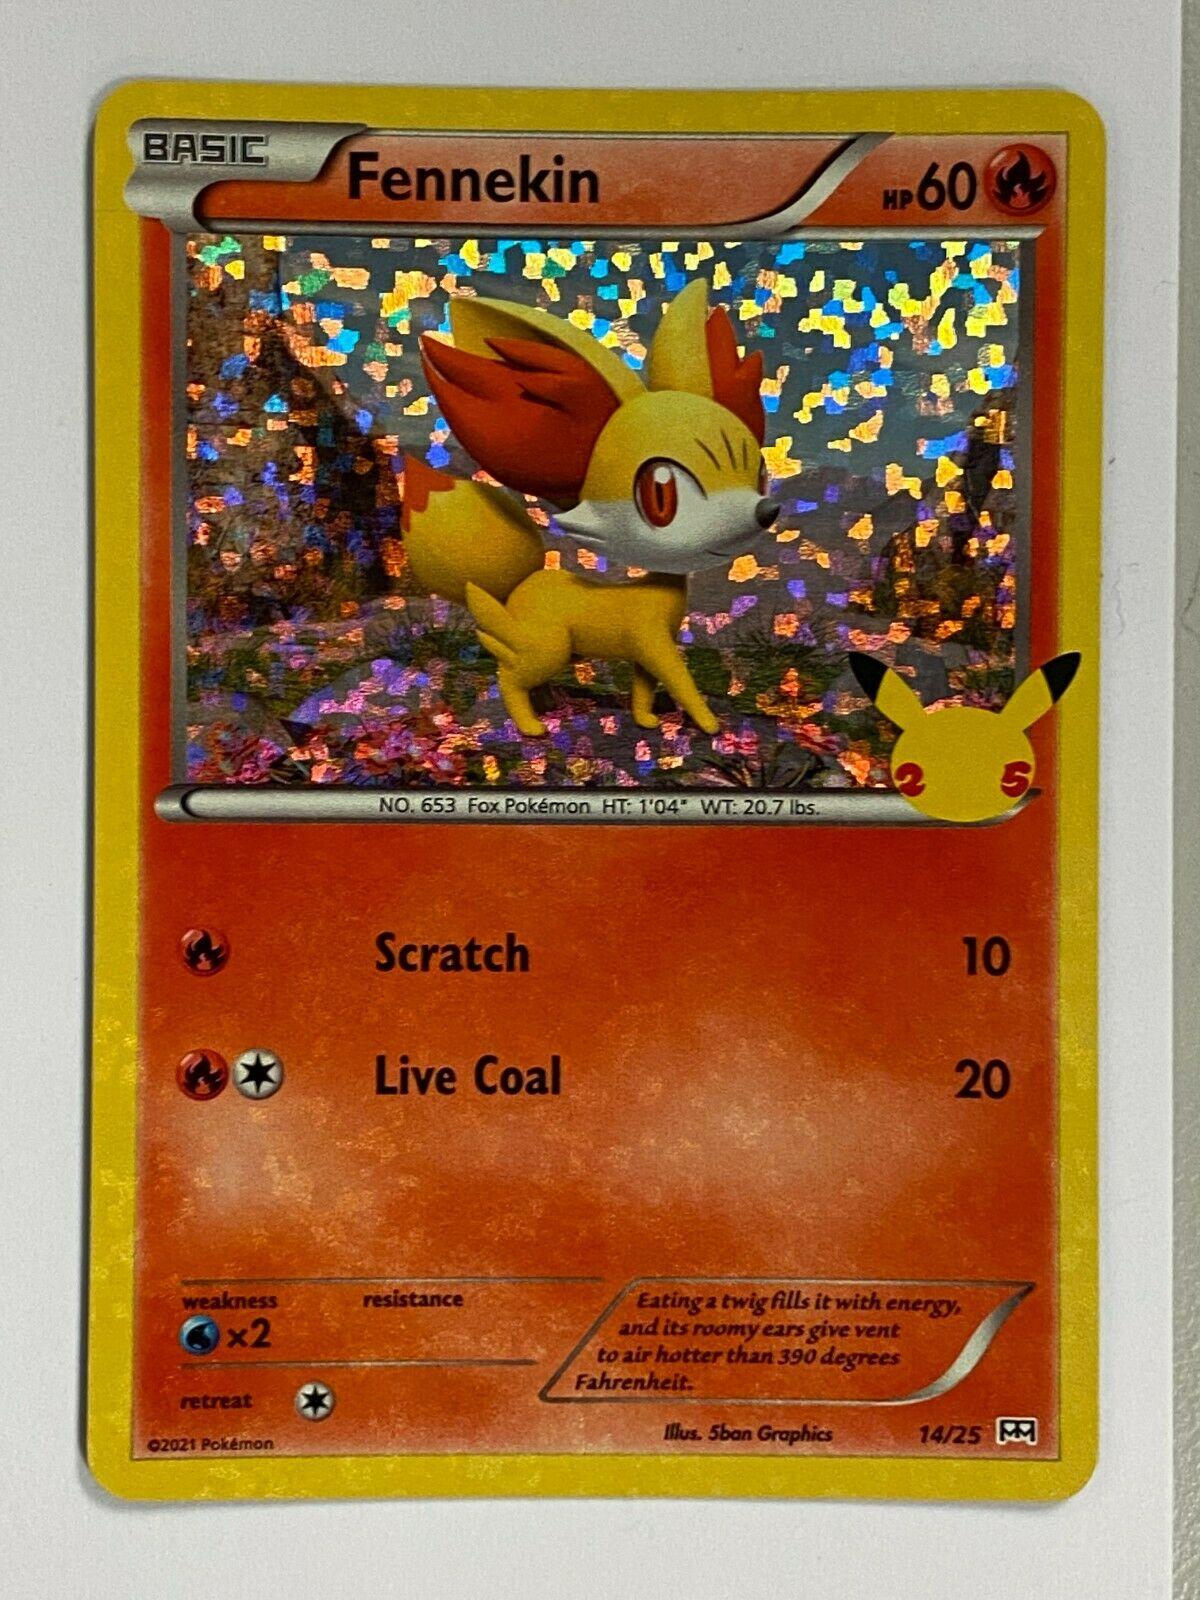 HOLO Fennekin 14/25 Pokemon McDonald's 25th Anniversary Cards